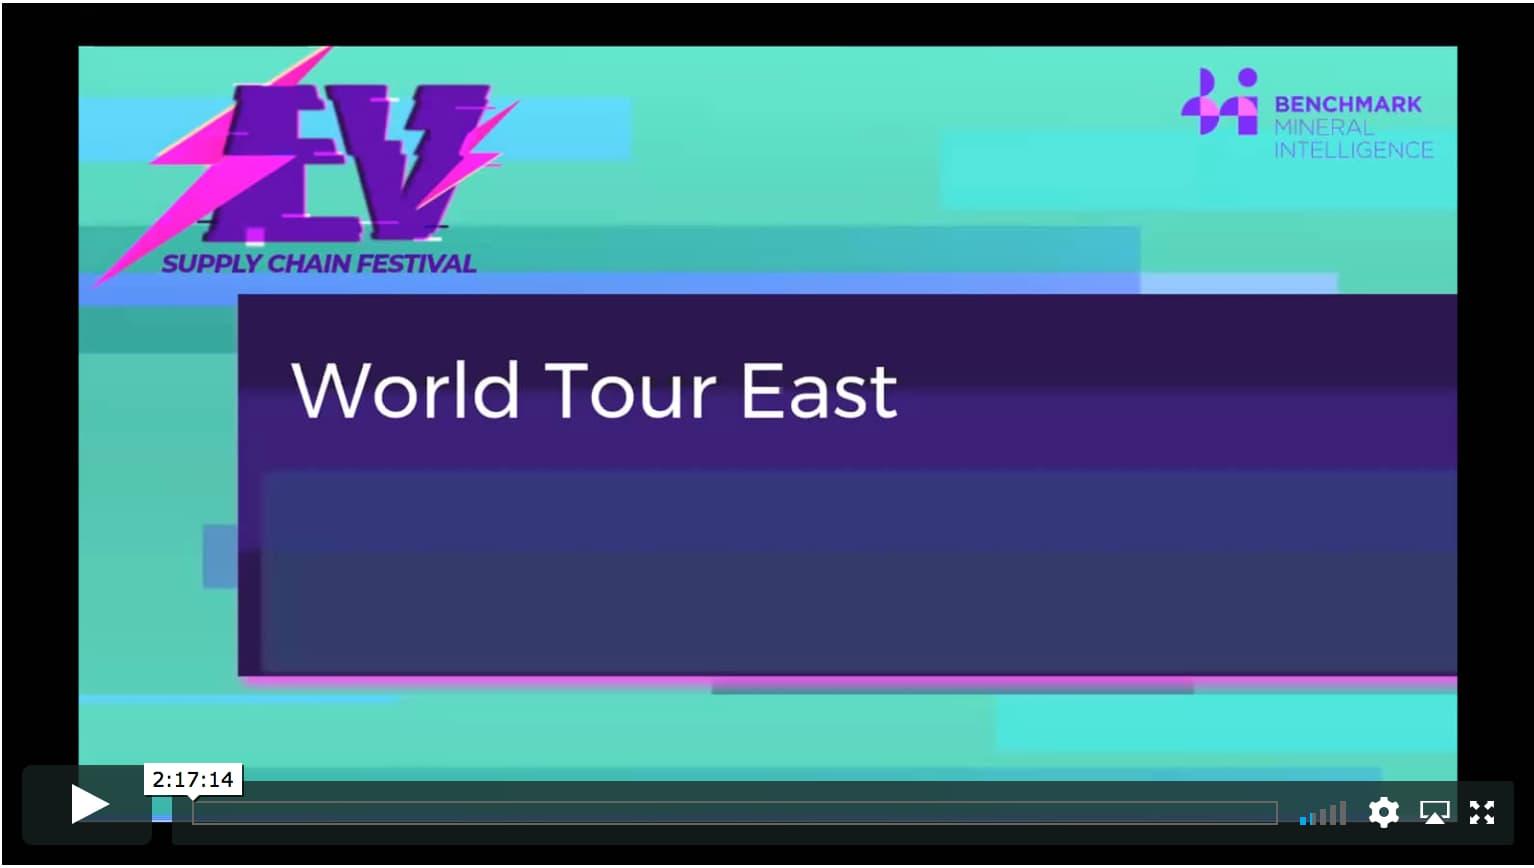 World Tour East